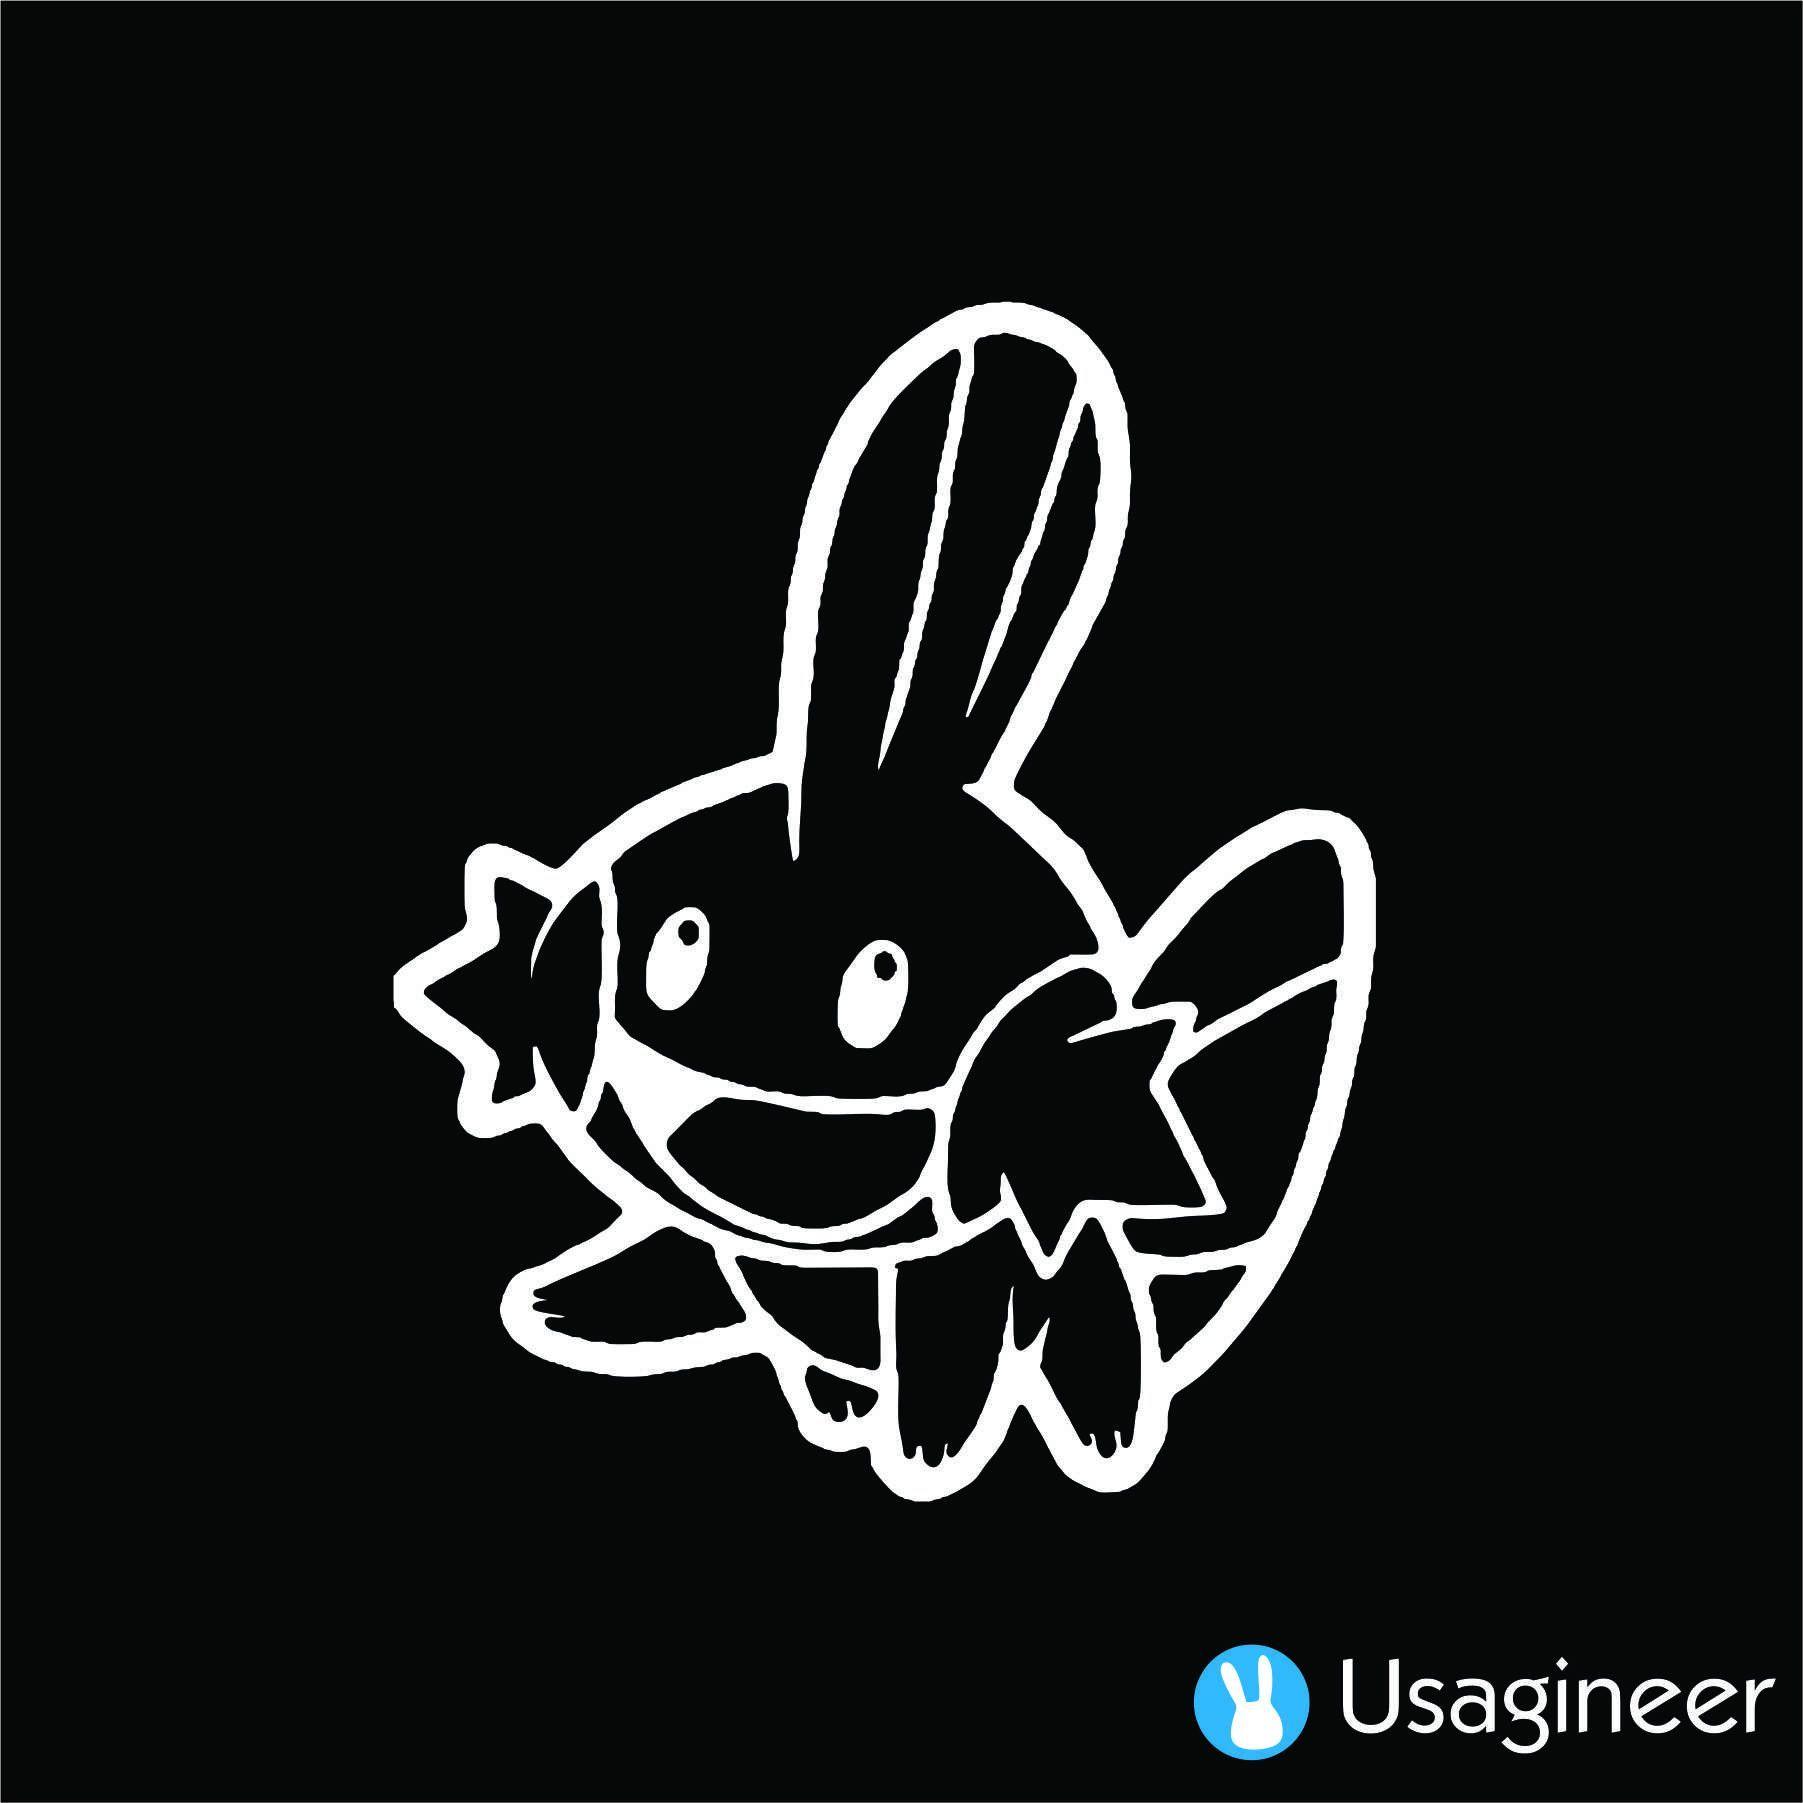 Pokemon Mudkip Vinyl Decal Sticker *SIZES* Wall Cartoon